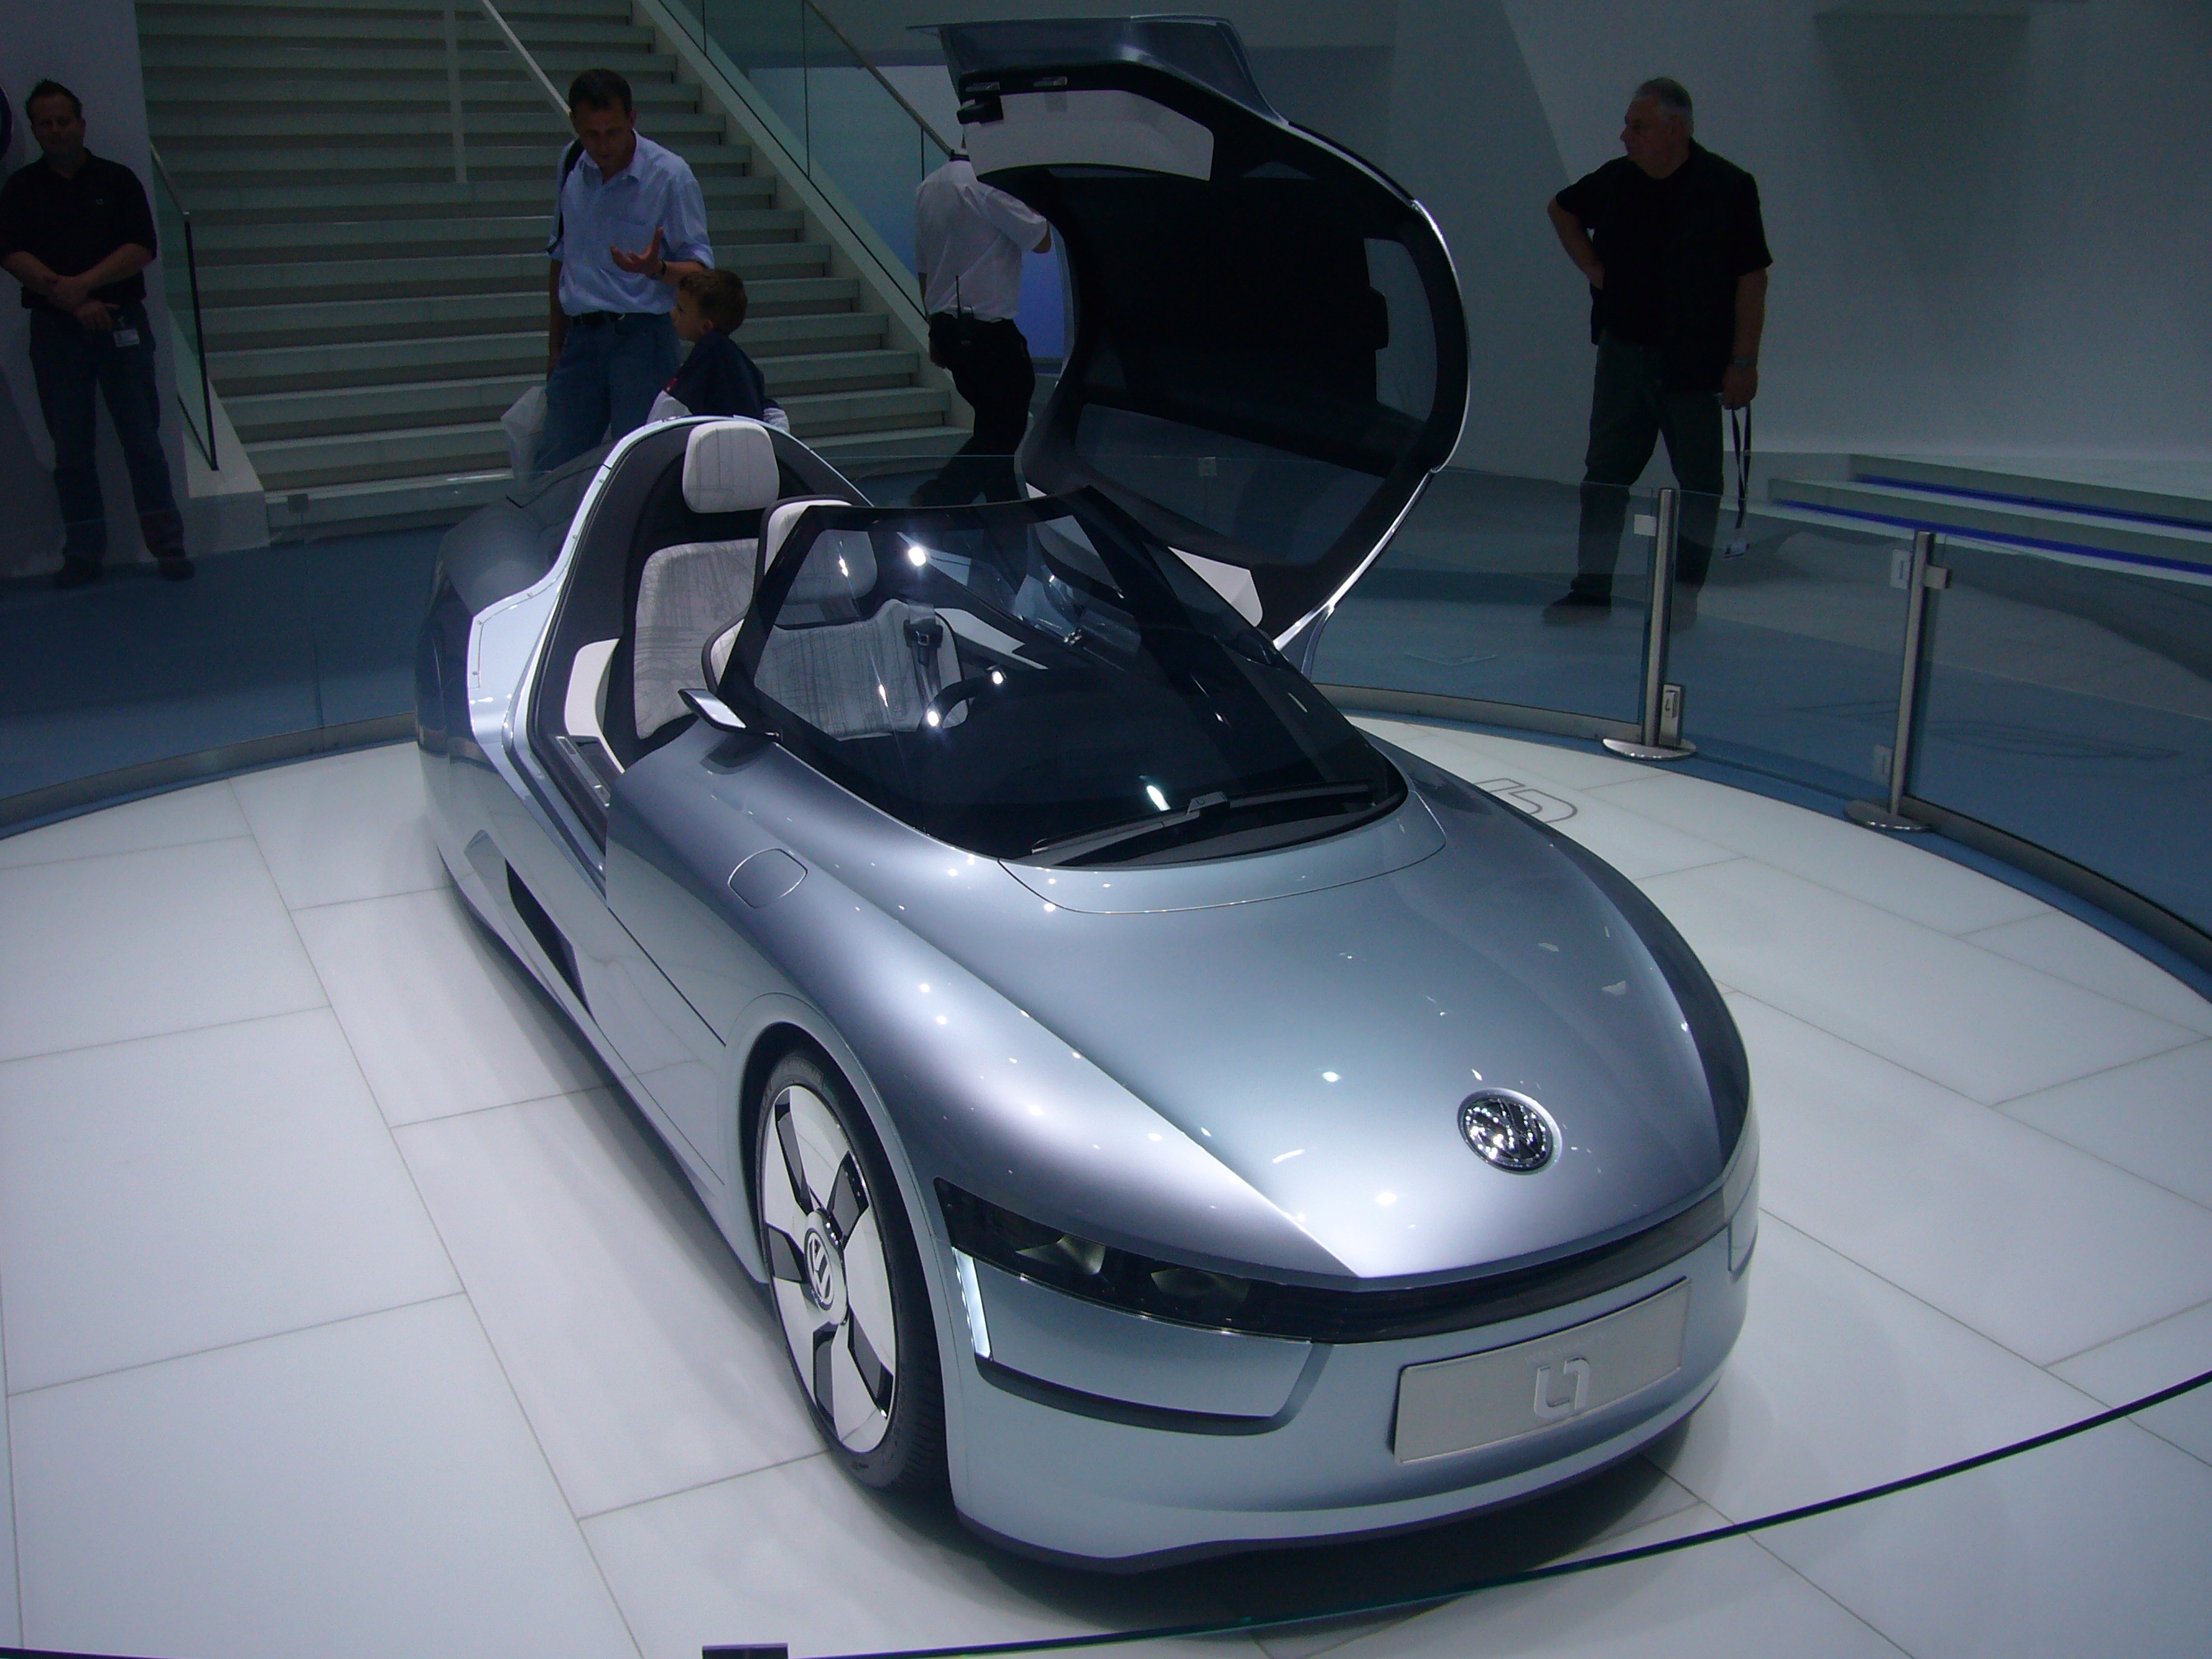 File:Volkswagen L1 (front quarter).jpg - Wikimedia Commons